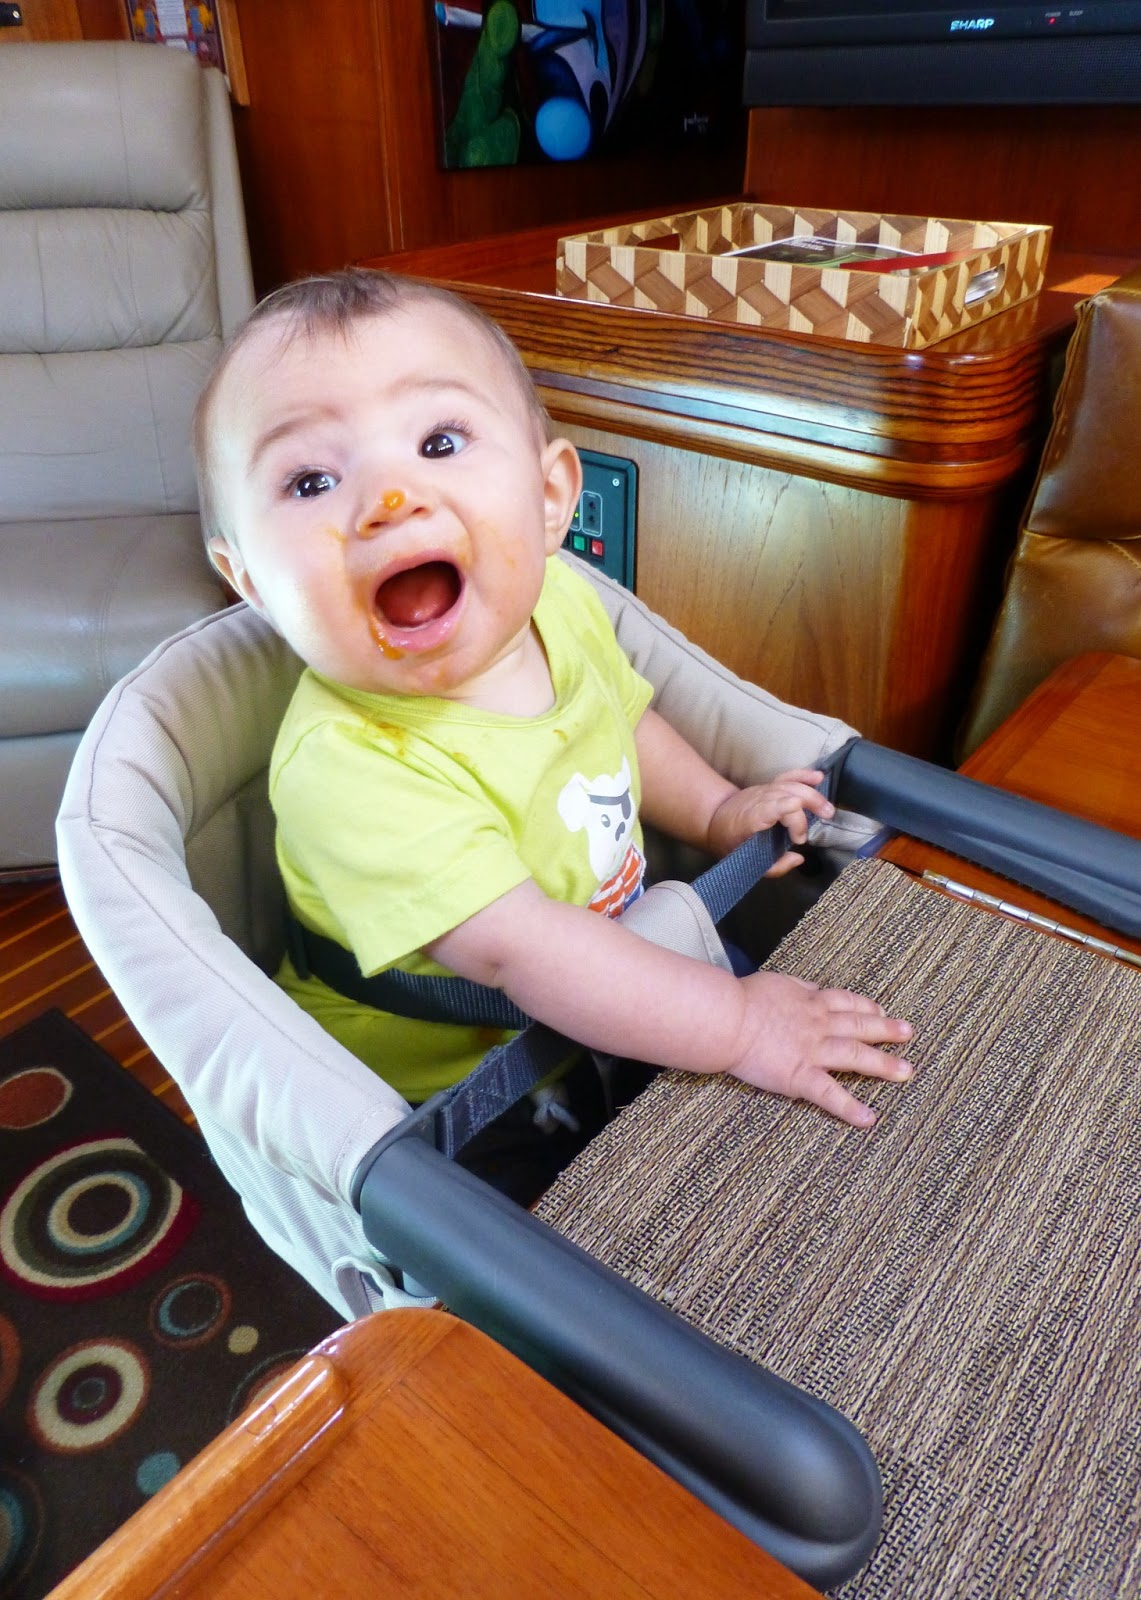 Inglesina fast table chair marina - Inglesina Fast Table Chair